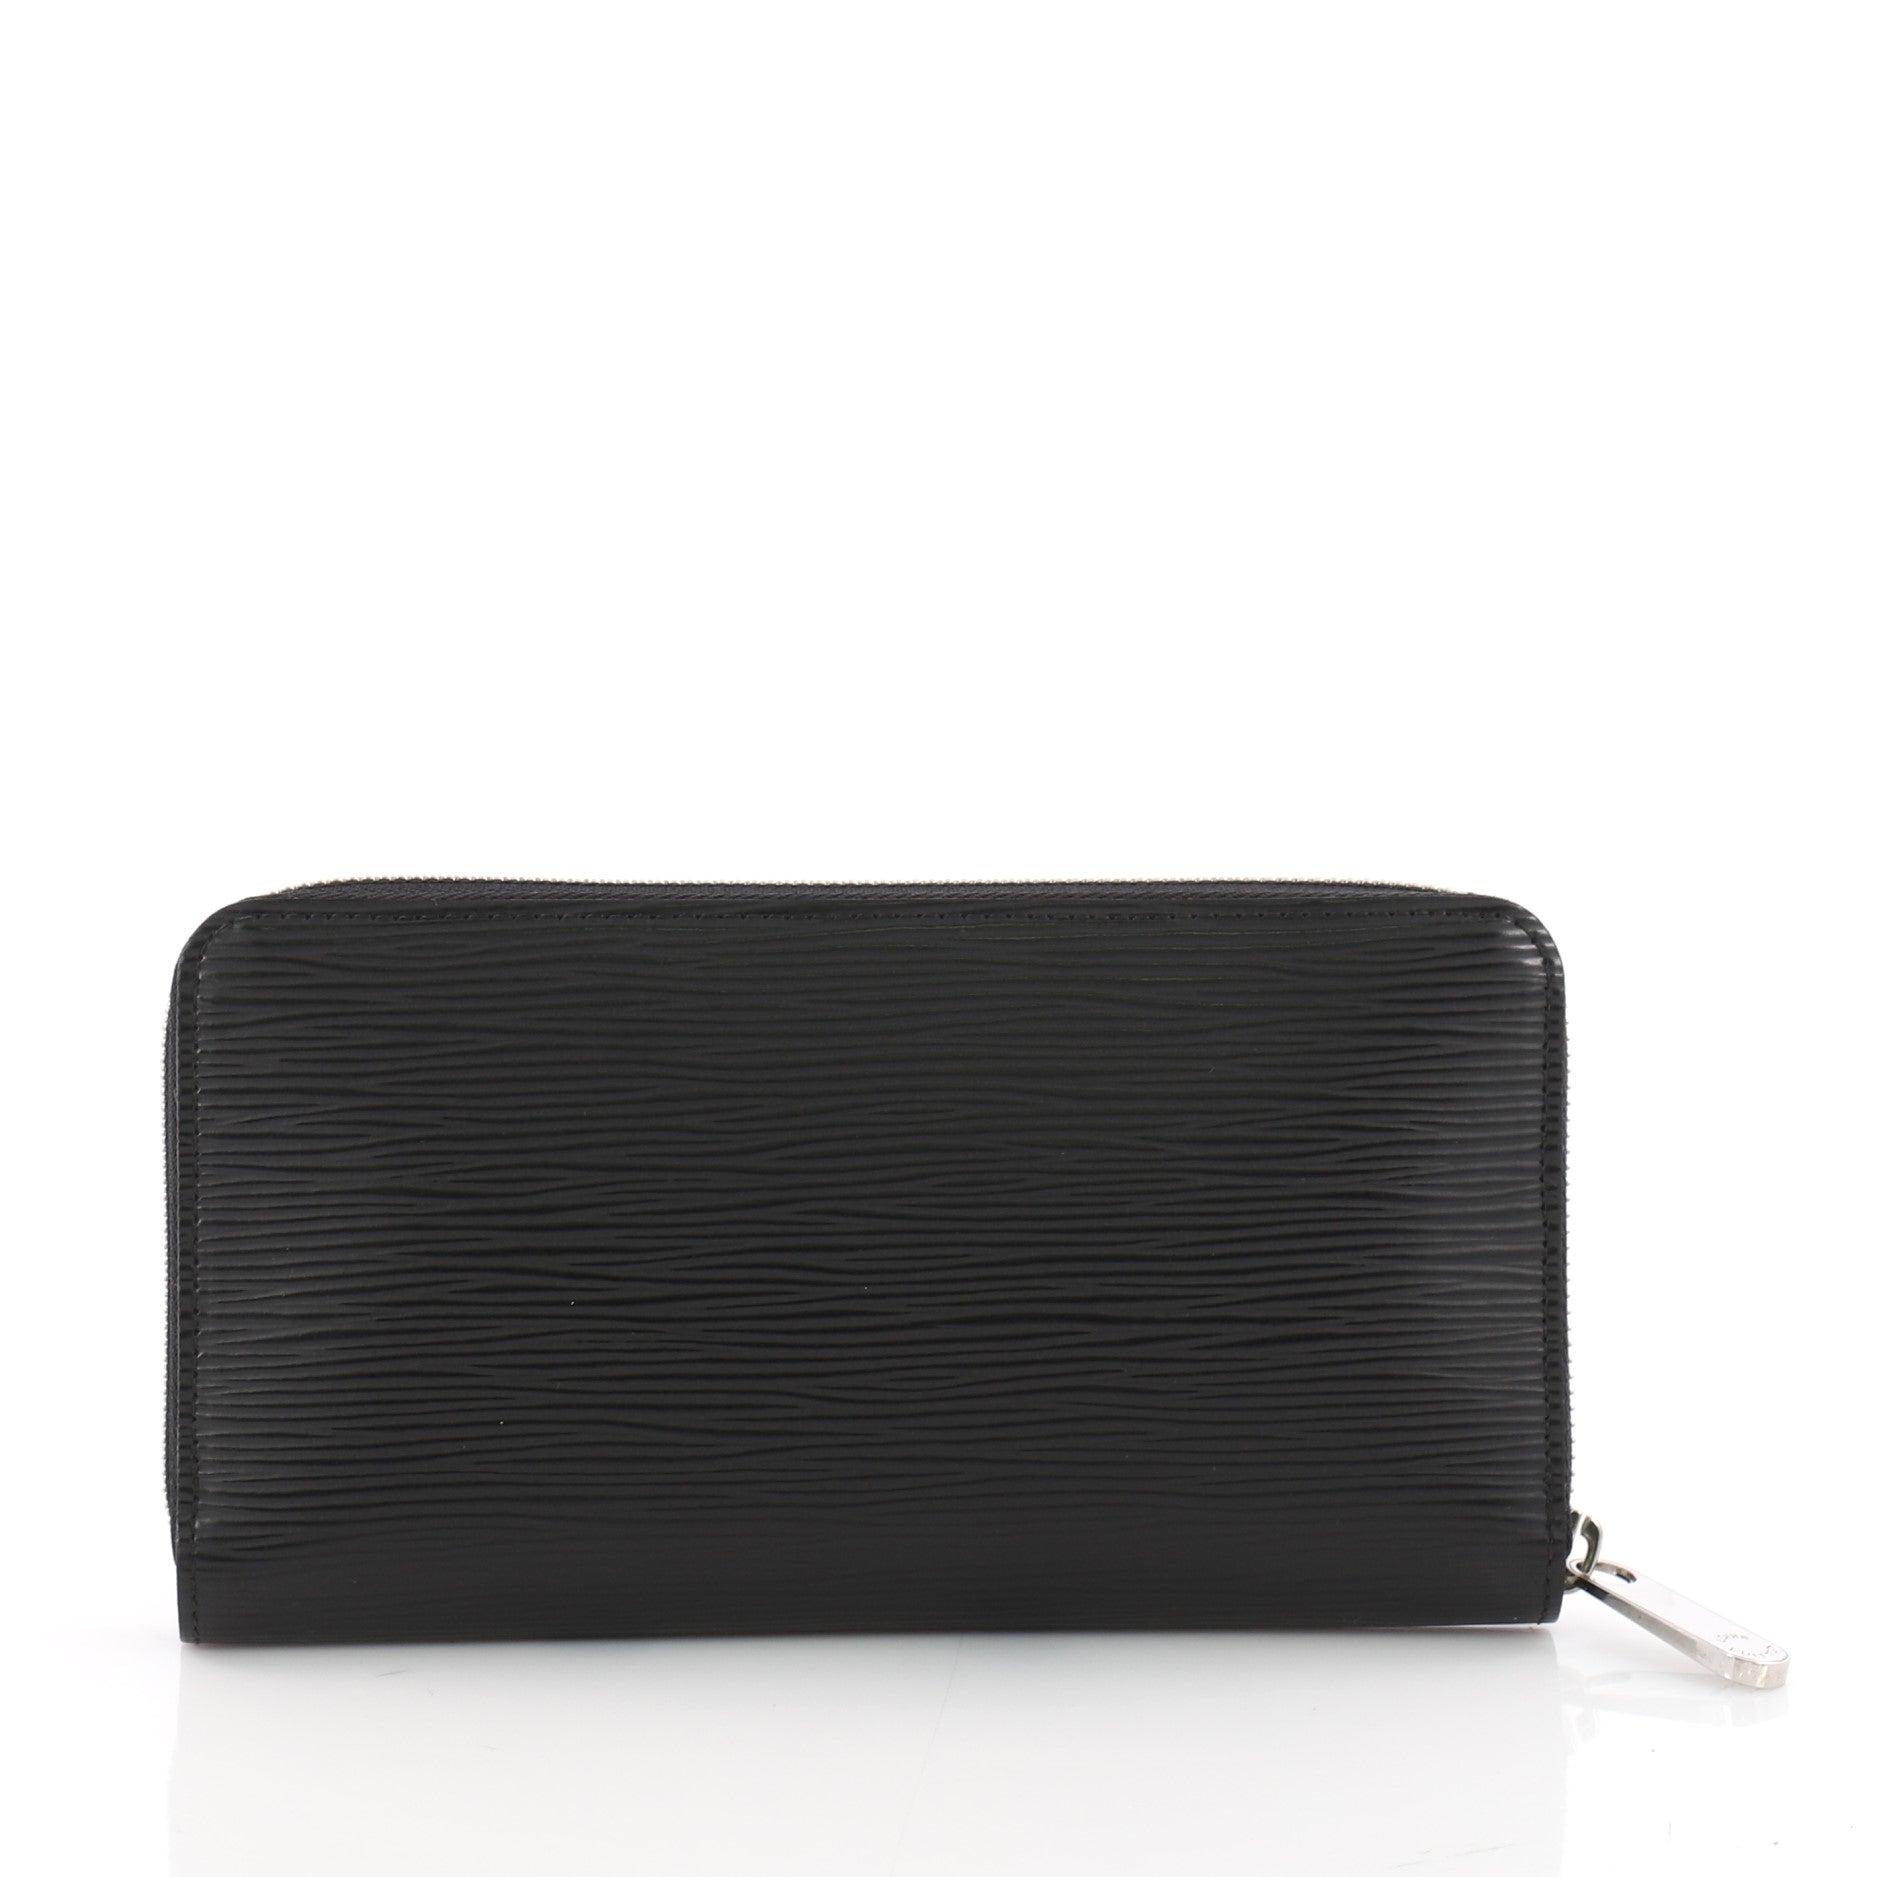 79f9d4a60d71 Louis Vuitton Zippy Wallet Epi Leather at 1stdibs